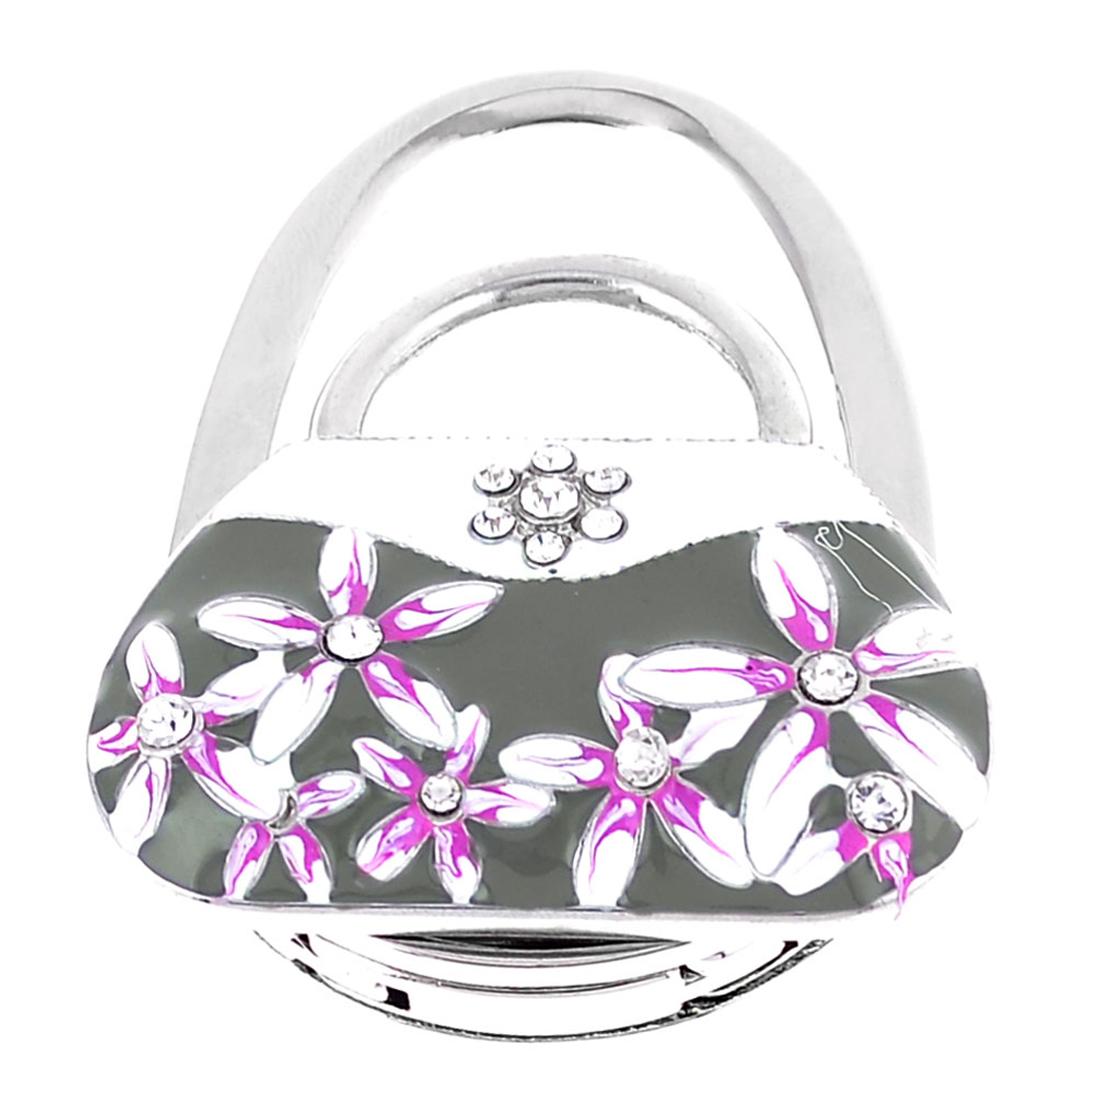 Rhinestone Inlaid Flowers Accent Handbag Shaped Silver Tone Hand Bag Hook Holder